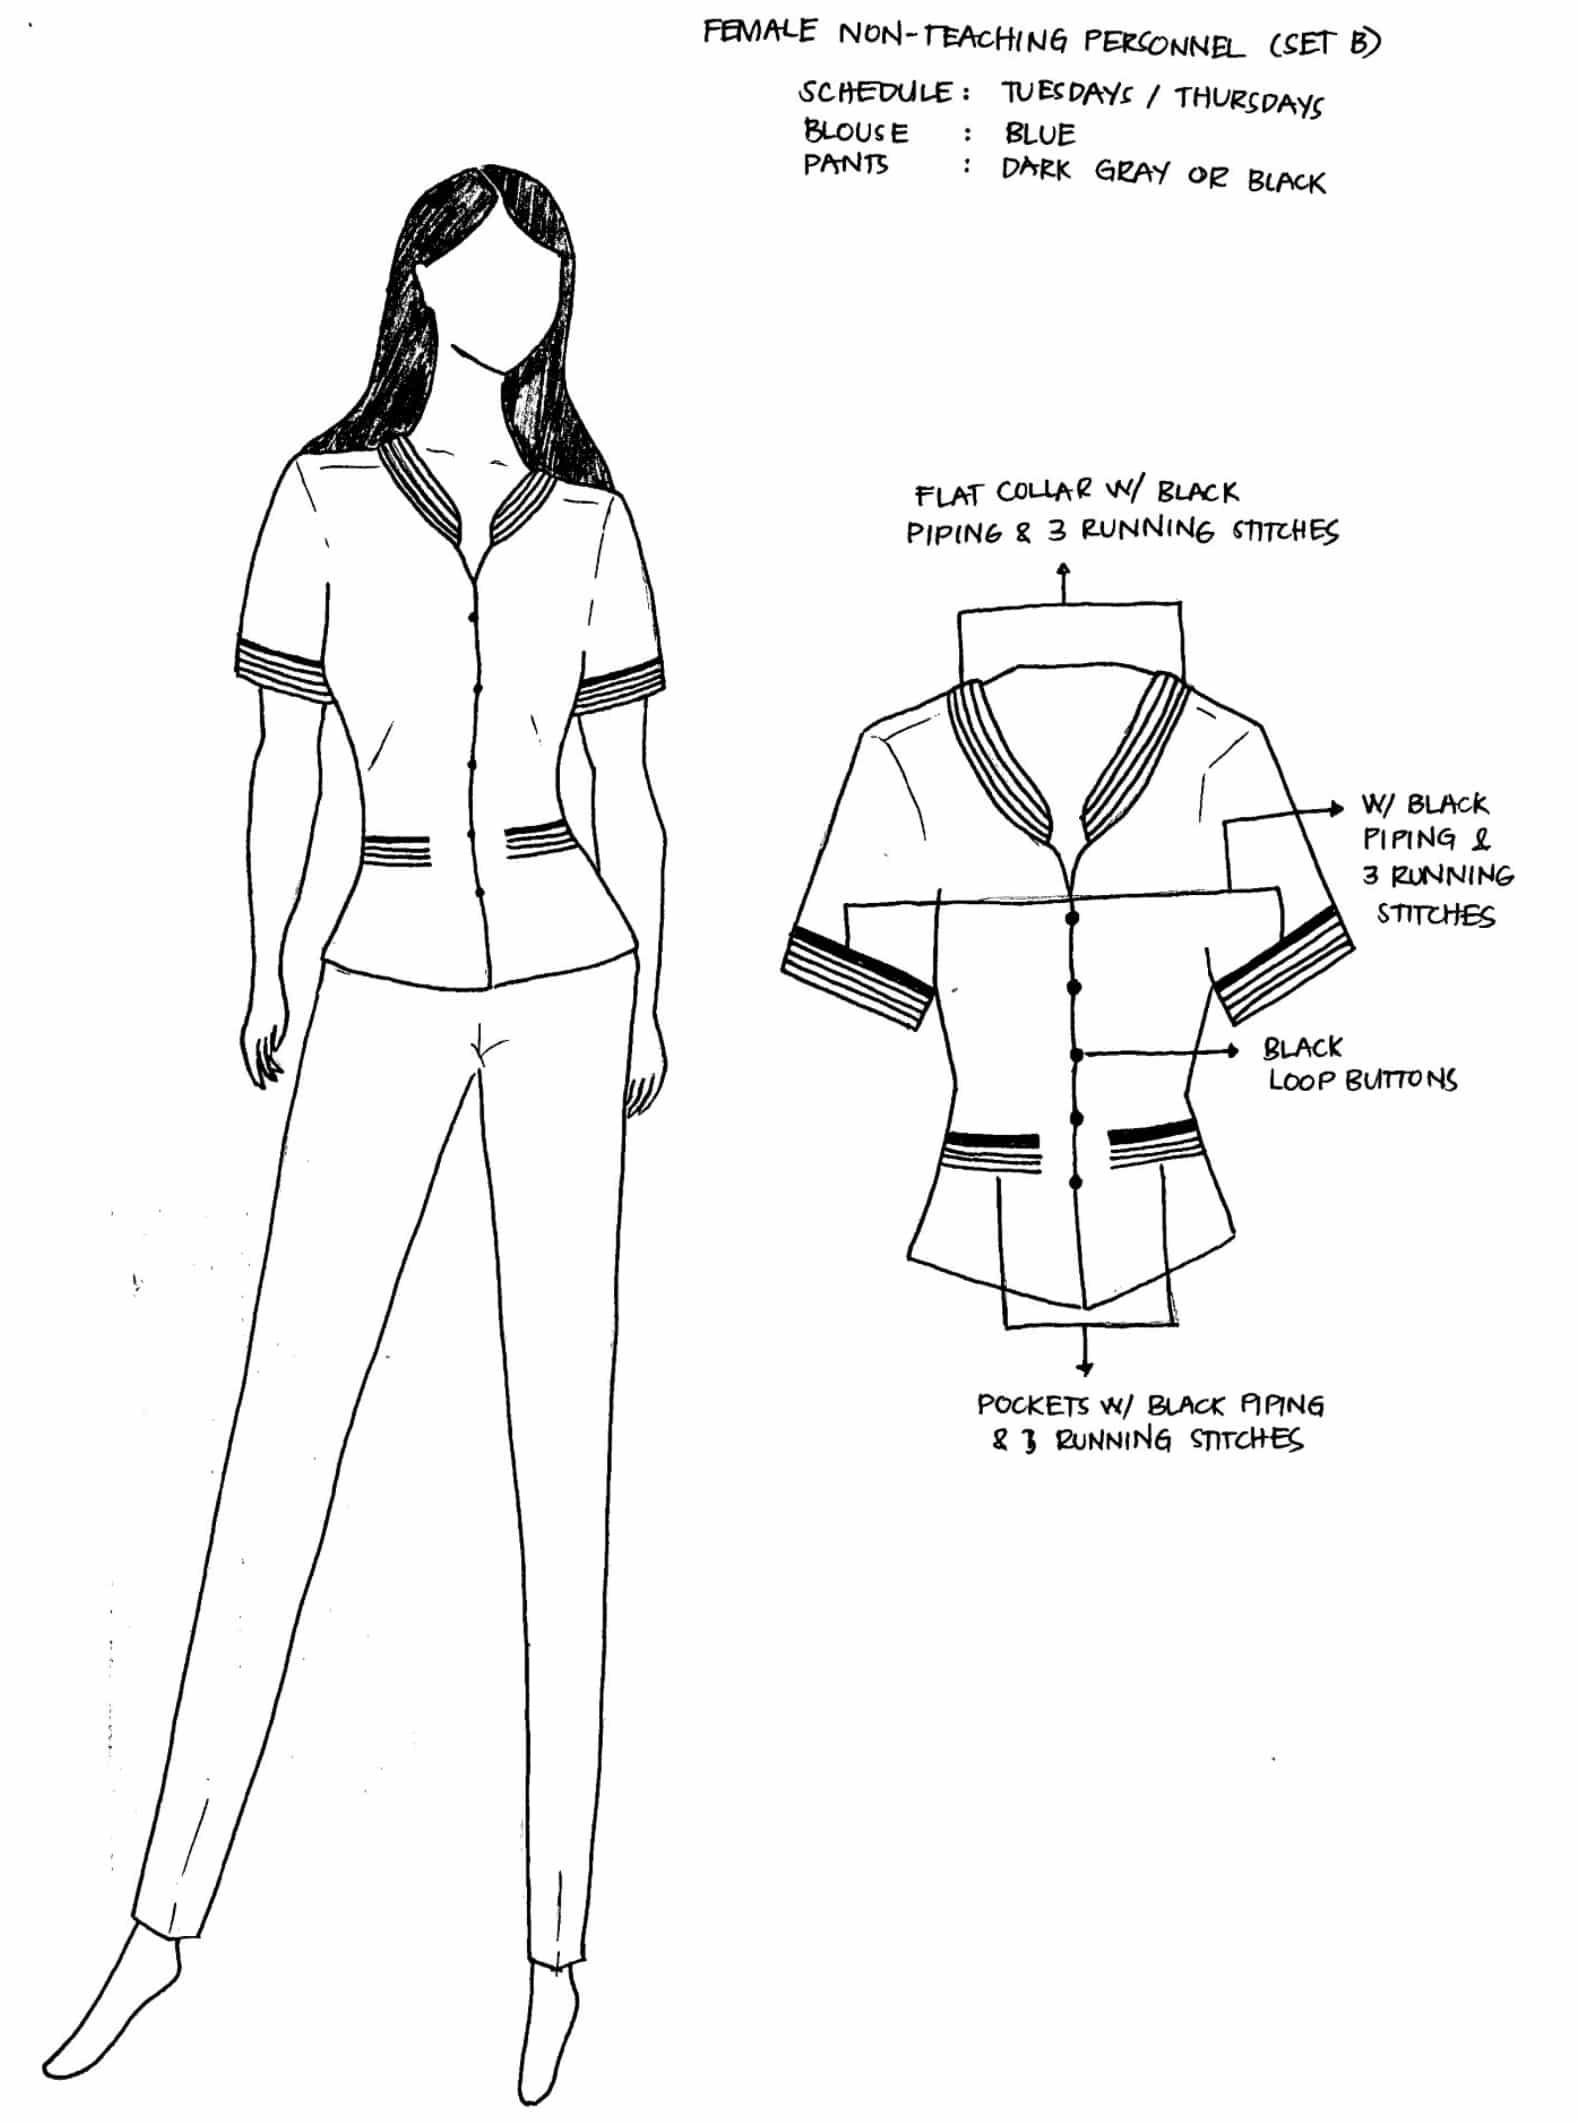 DepEd National Uniforms Female Non-Teaching Personnel (SET B)